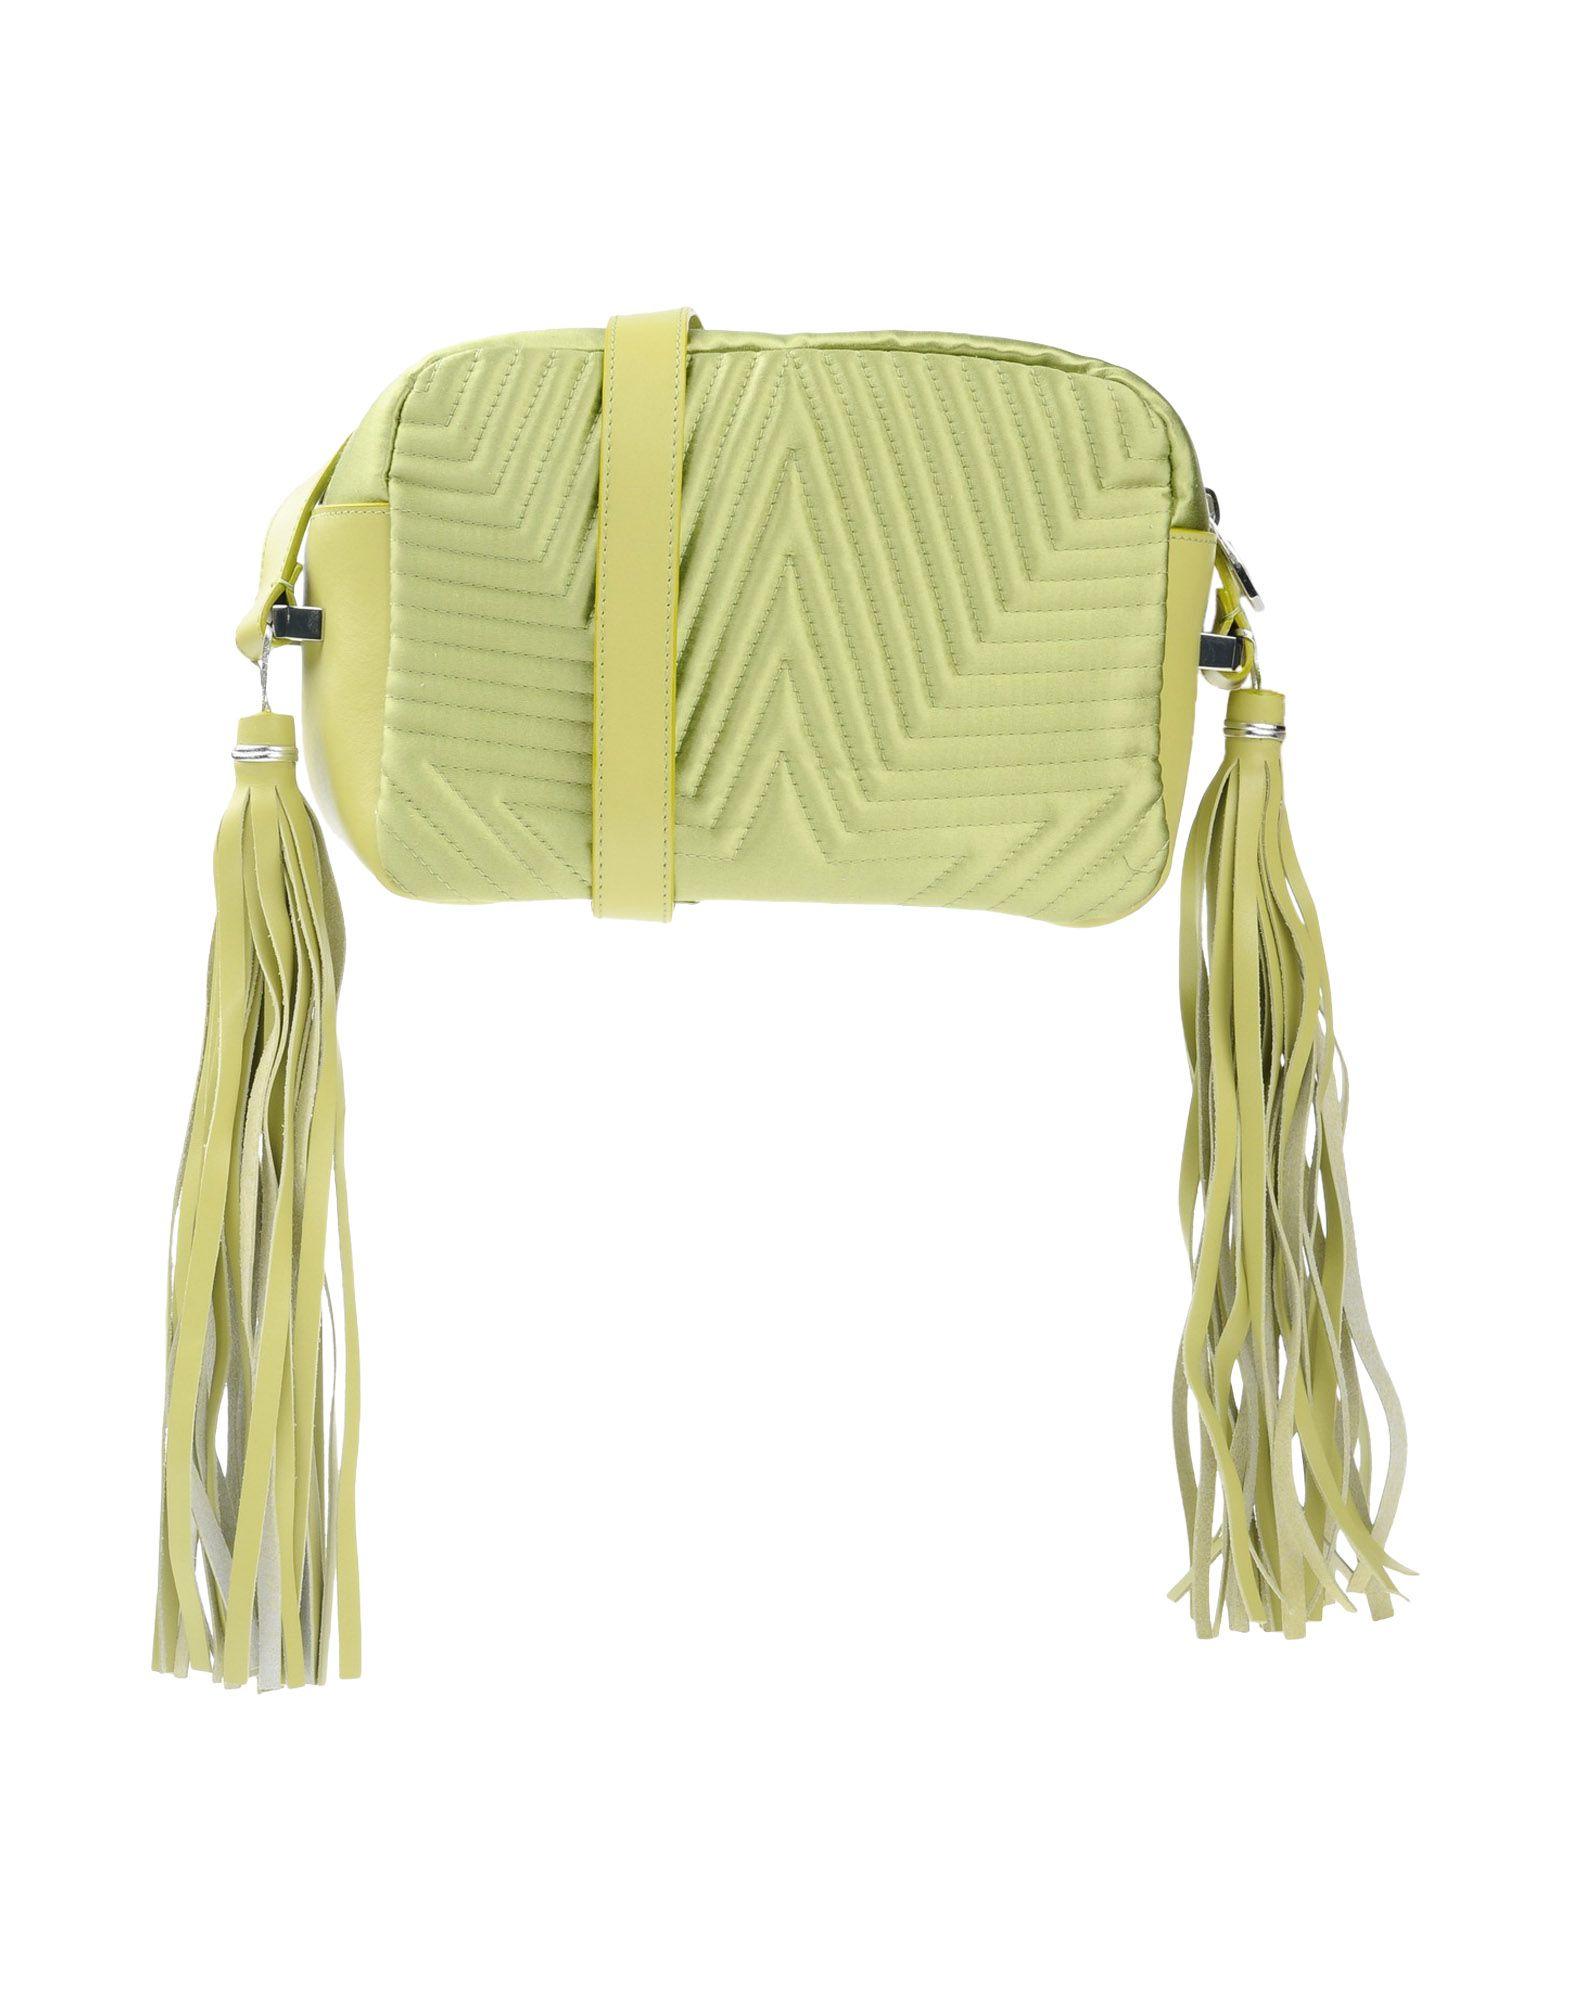 GOLDEN GOOSE DELUXE BRAND Сумка через плечо сумка через плечо new brand shippment price s9e canvas big bag